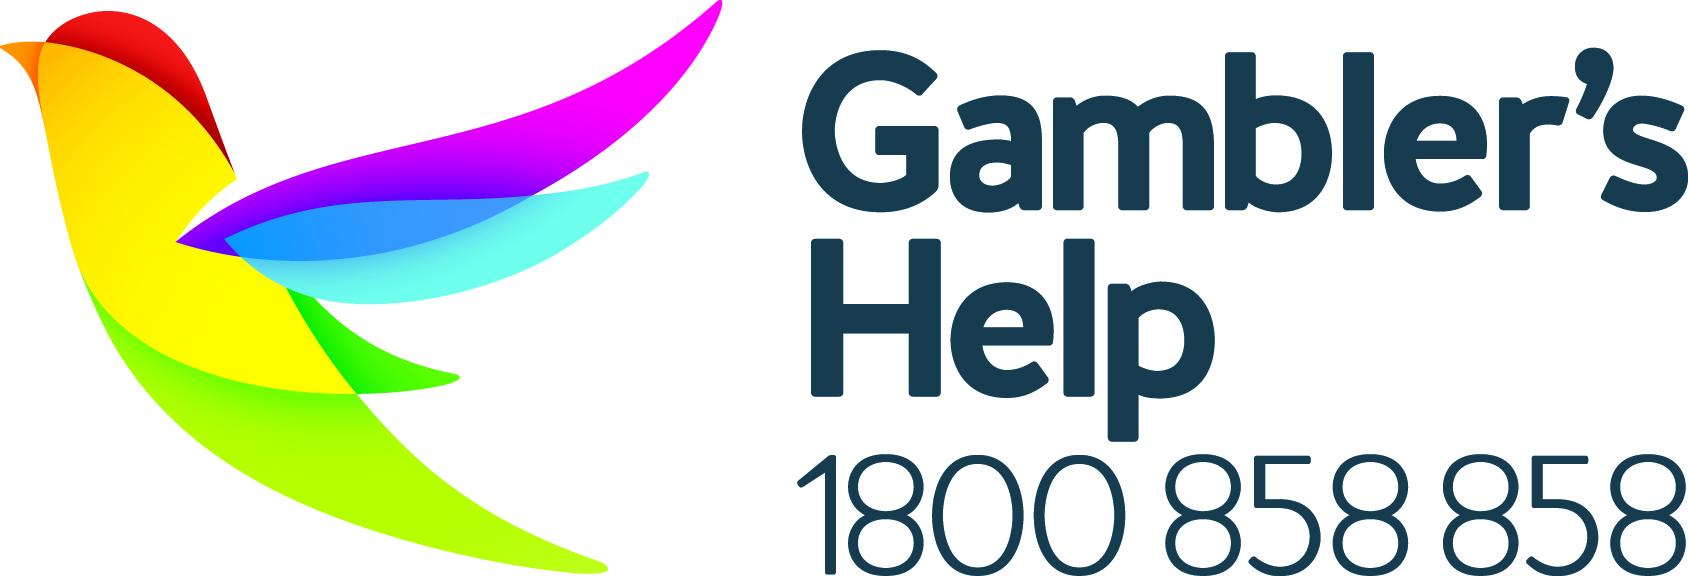 GamblersHelp_STD_PH_Full-Col_CMYK_HR.jpg